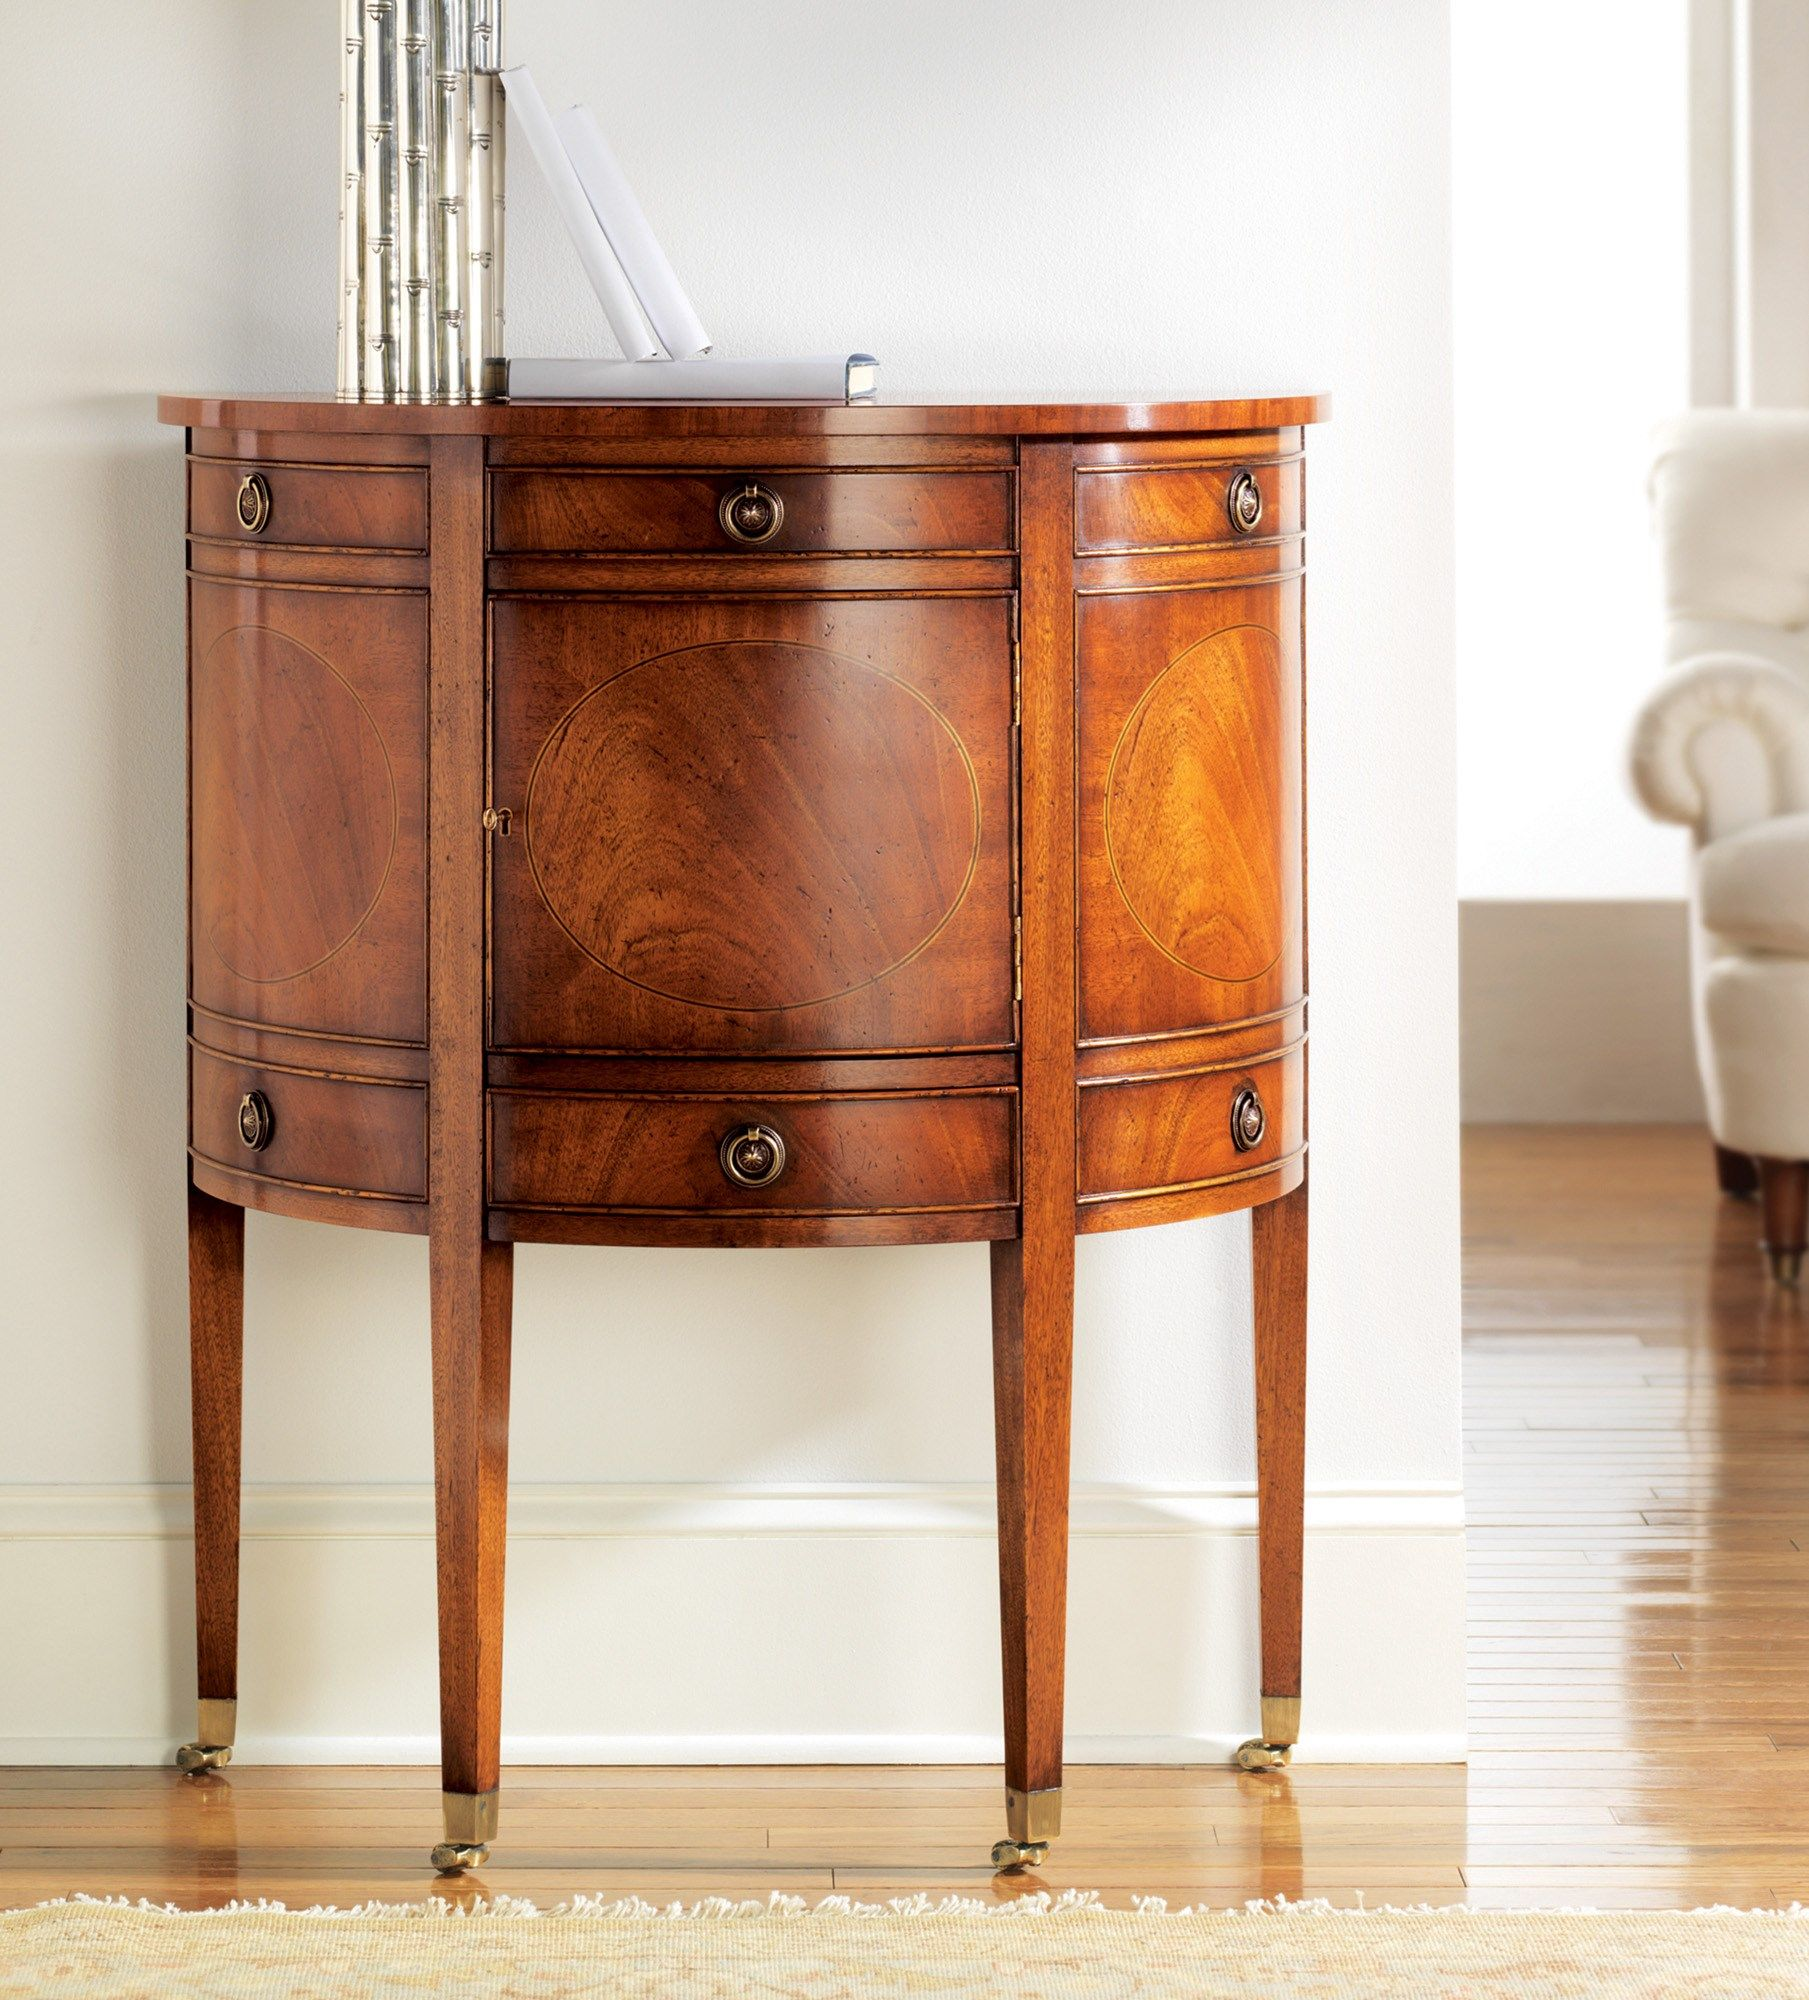 historic modern wood furniture. Historic Modern Wood Furniture. History Furniture T I